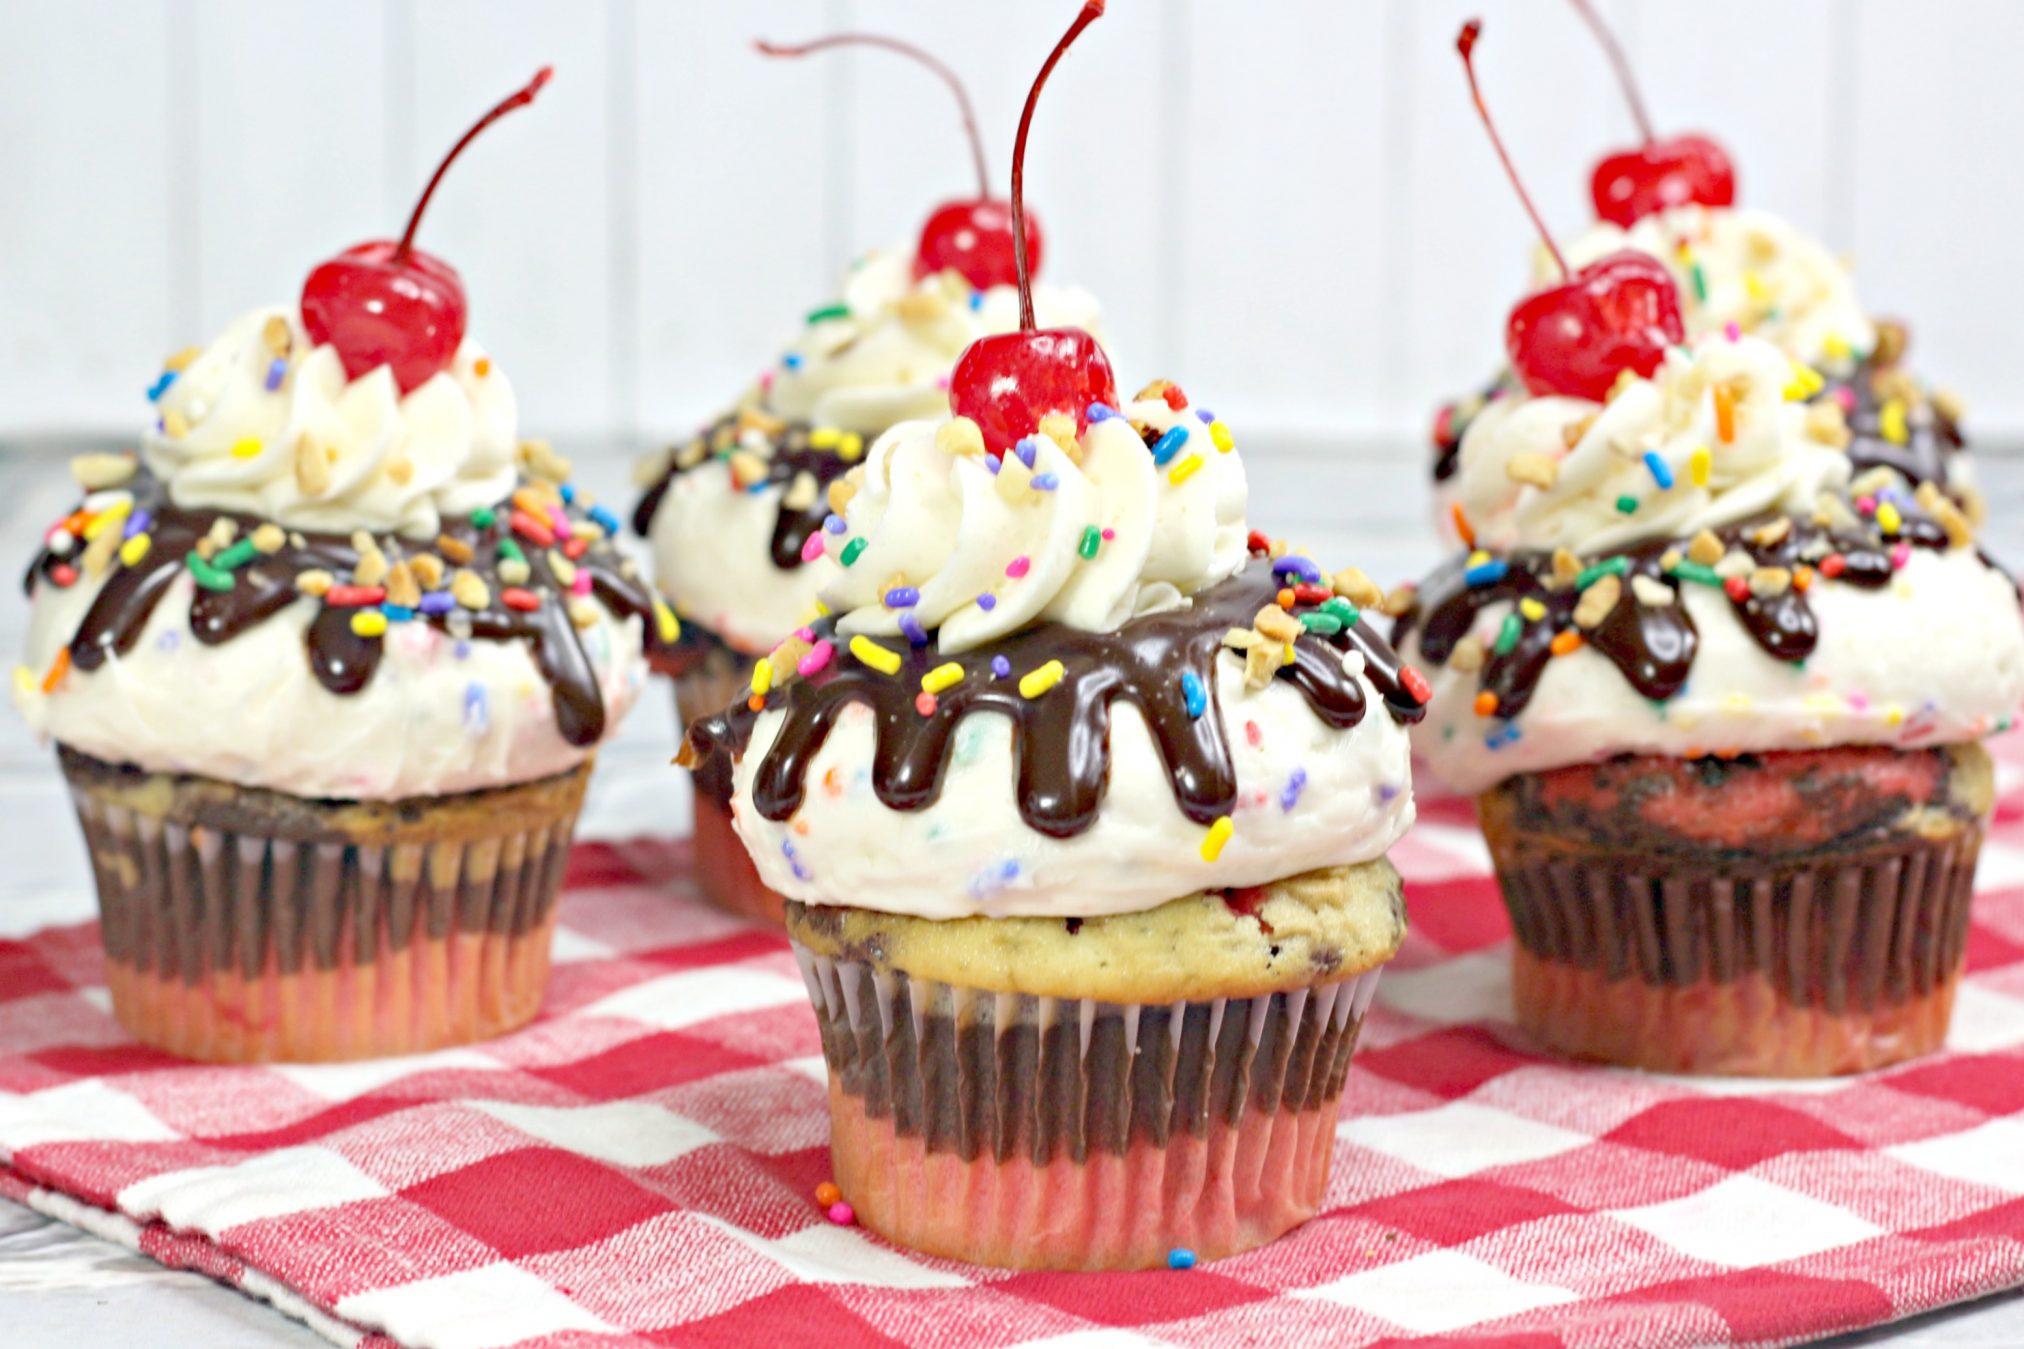 Super Fun Banana Split Cupcakes #ExtremeCupcakes